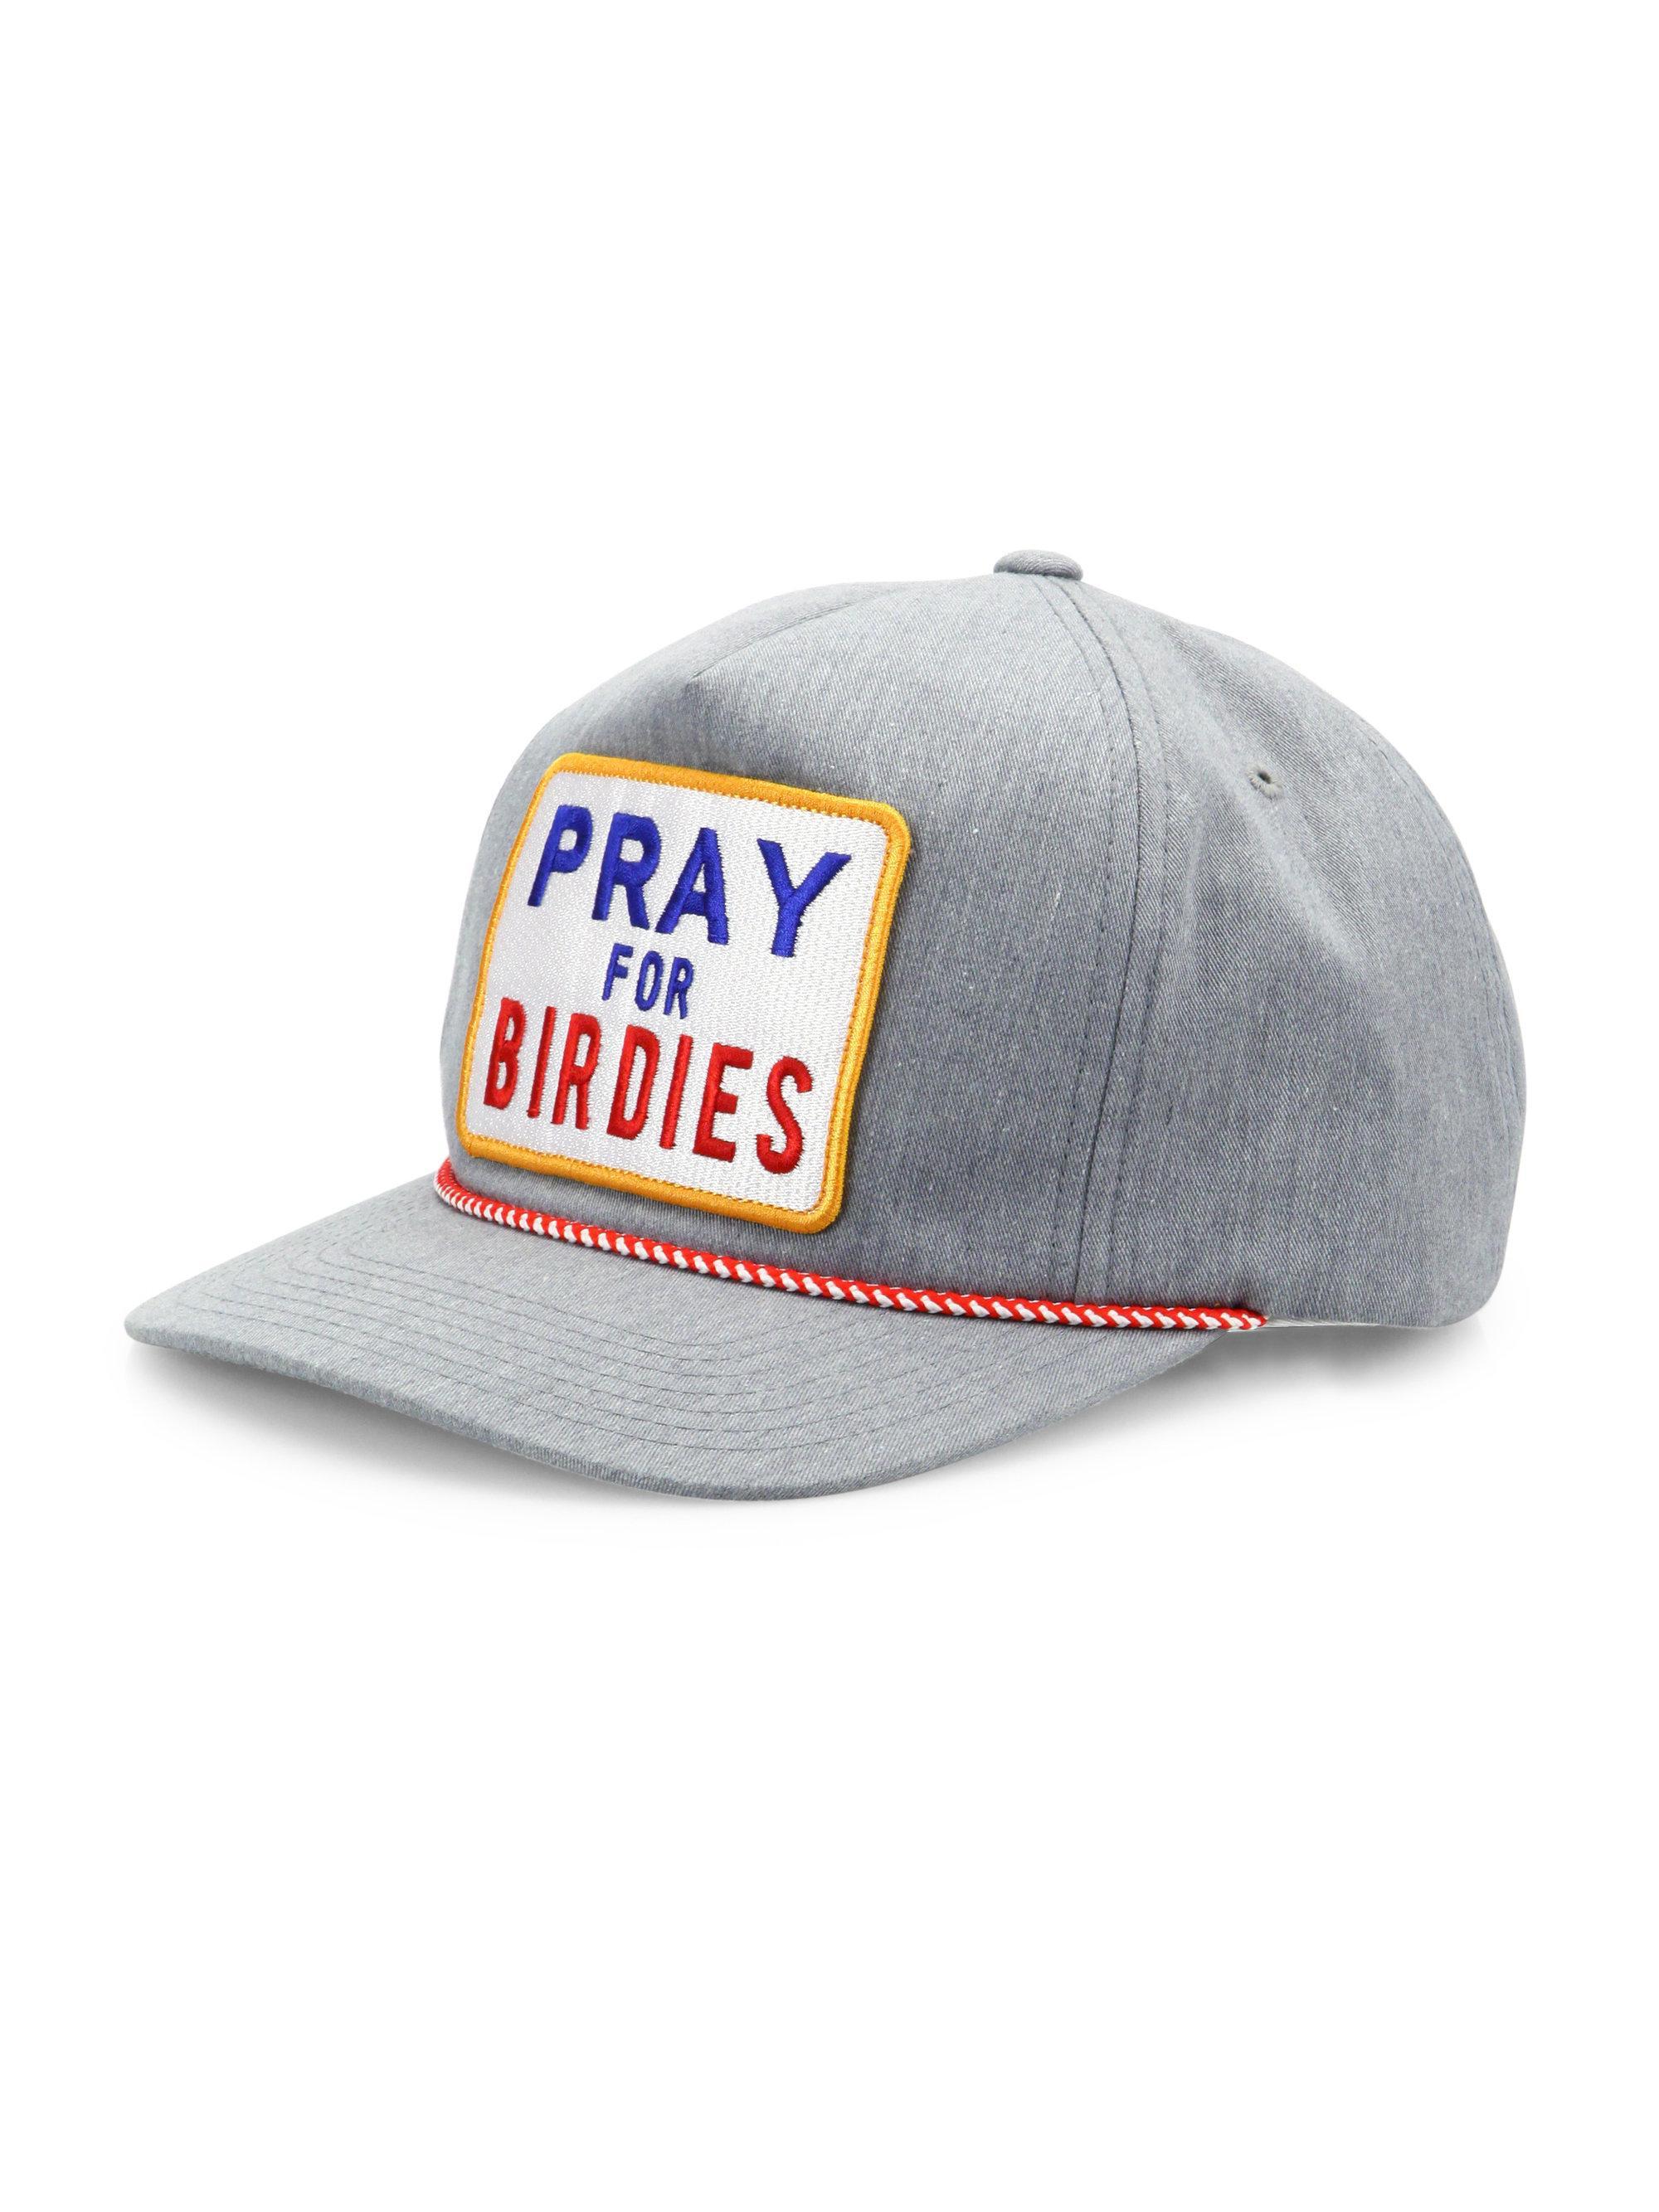 26b5845b305 Lyst - G FORE Pray For Birdies Cap in Gray for Men